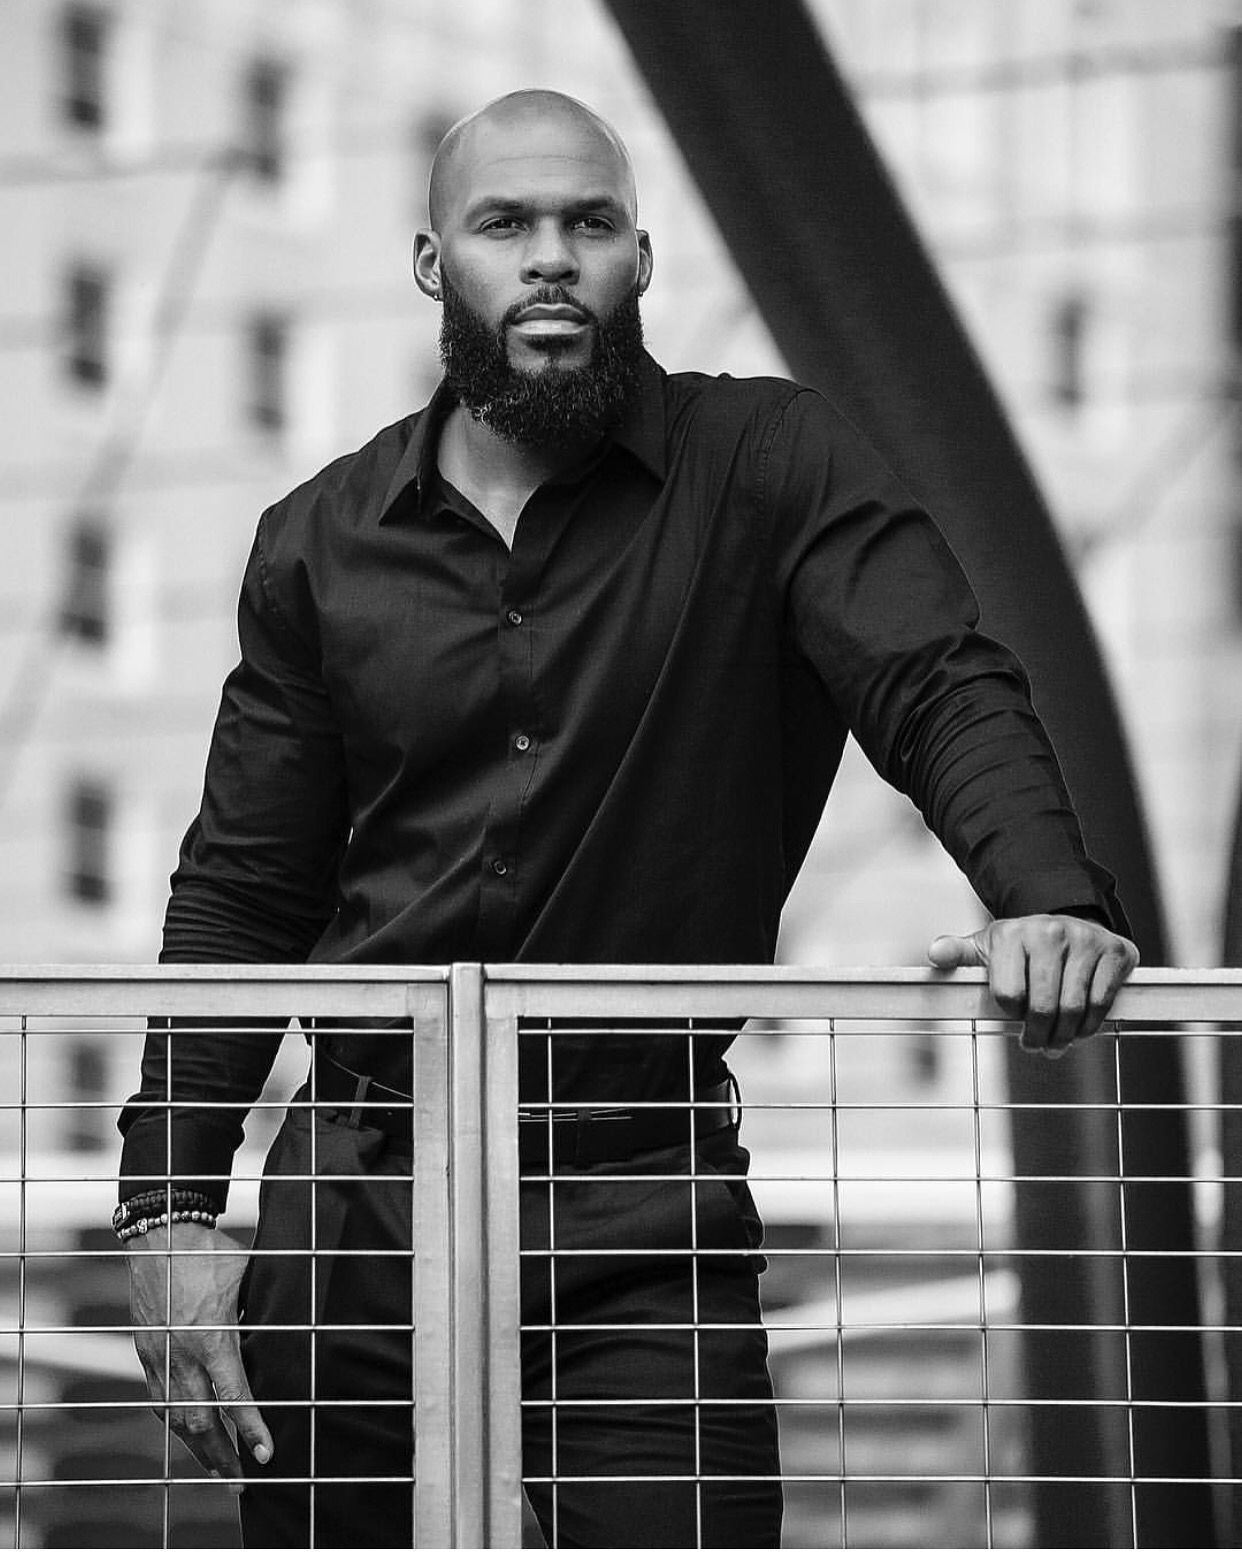 Pin On Beards Styles Black Men